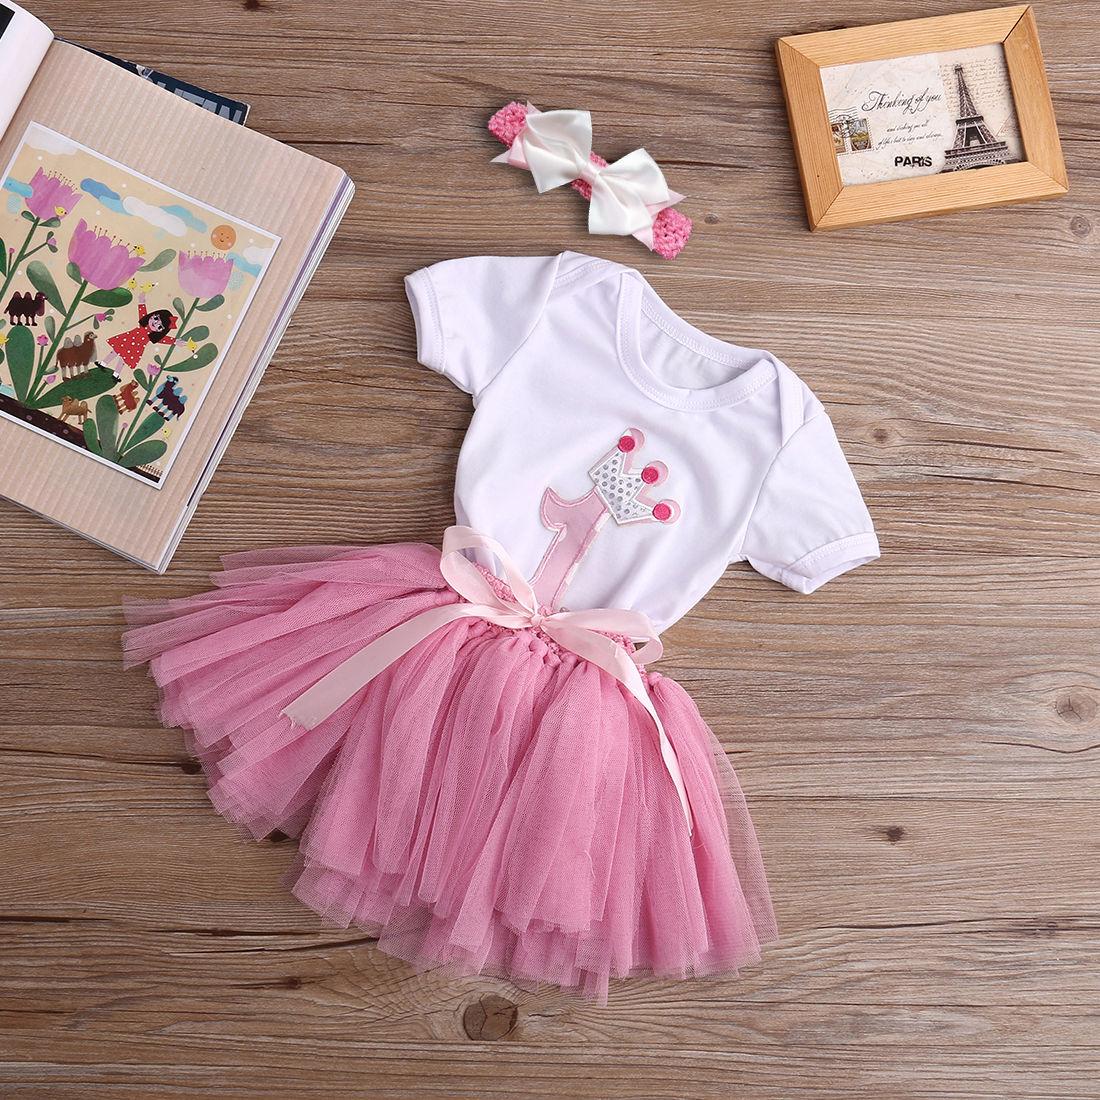 2016-New-Baby-Girls-Summer-Dress-kids-1st-Crown-Romper-Headband-Birthday-Tutu-Dress-Outfit-3pcs-1